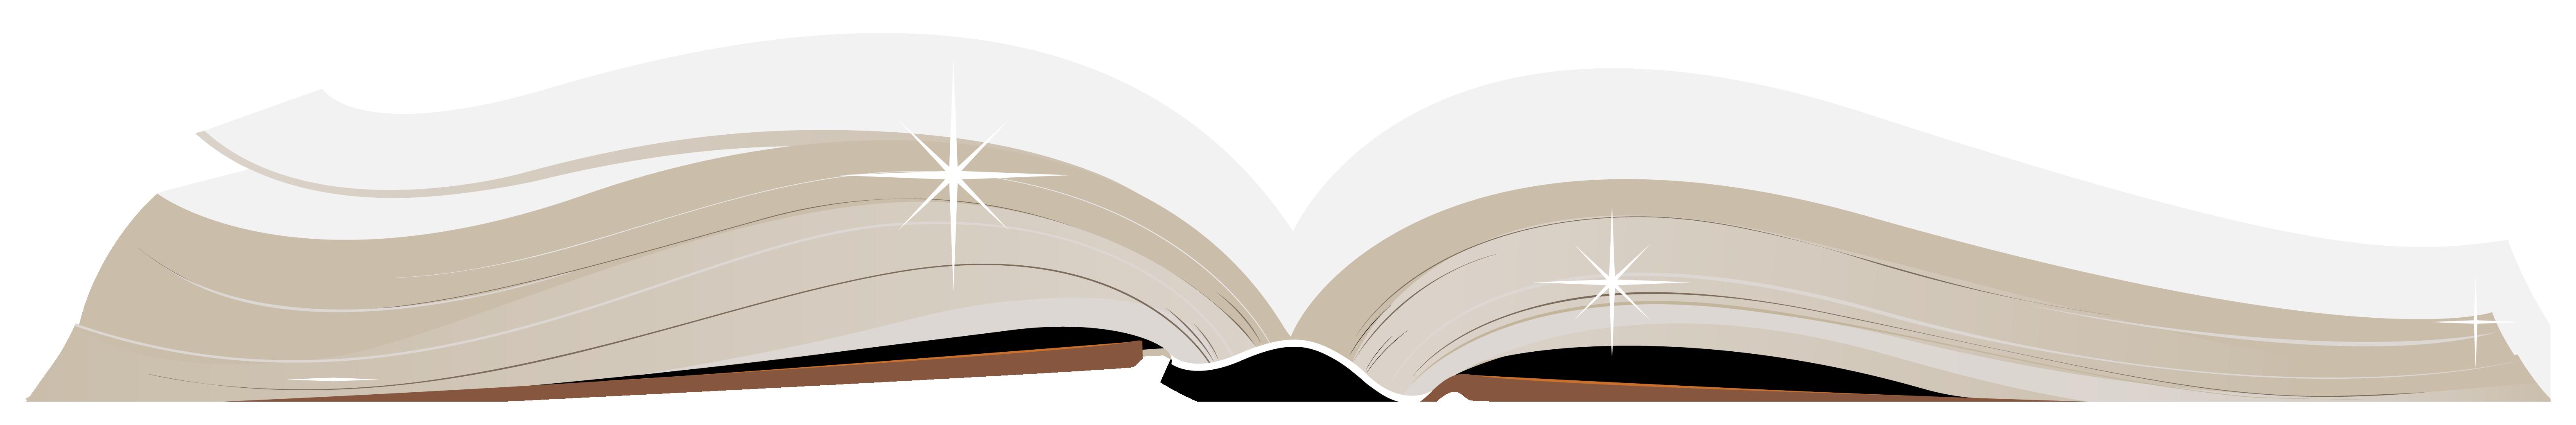 Png clipart best web. Open book clip art magic